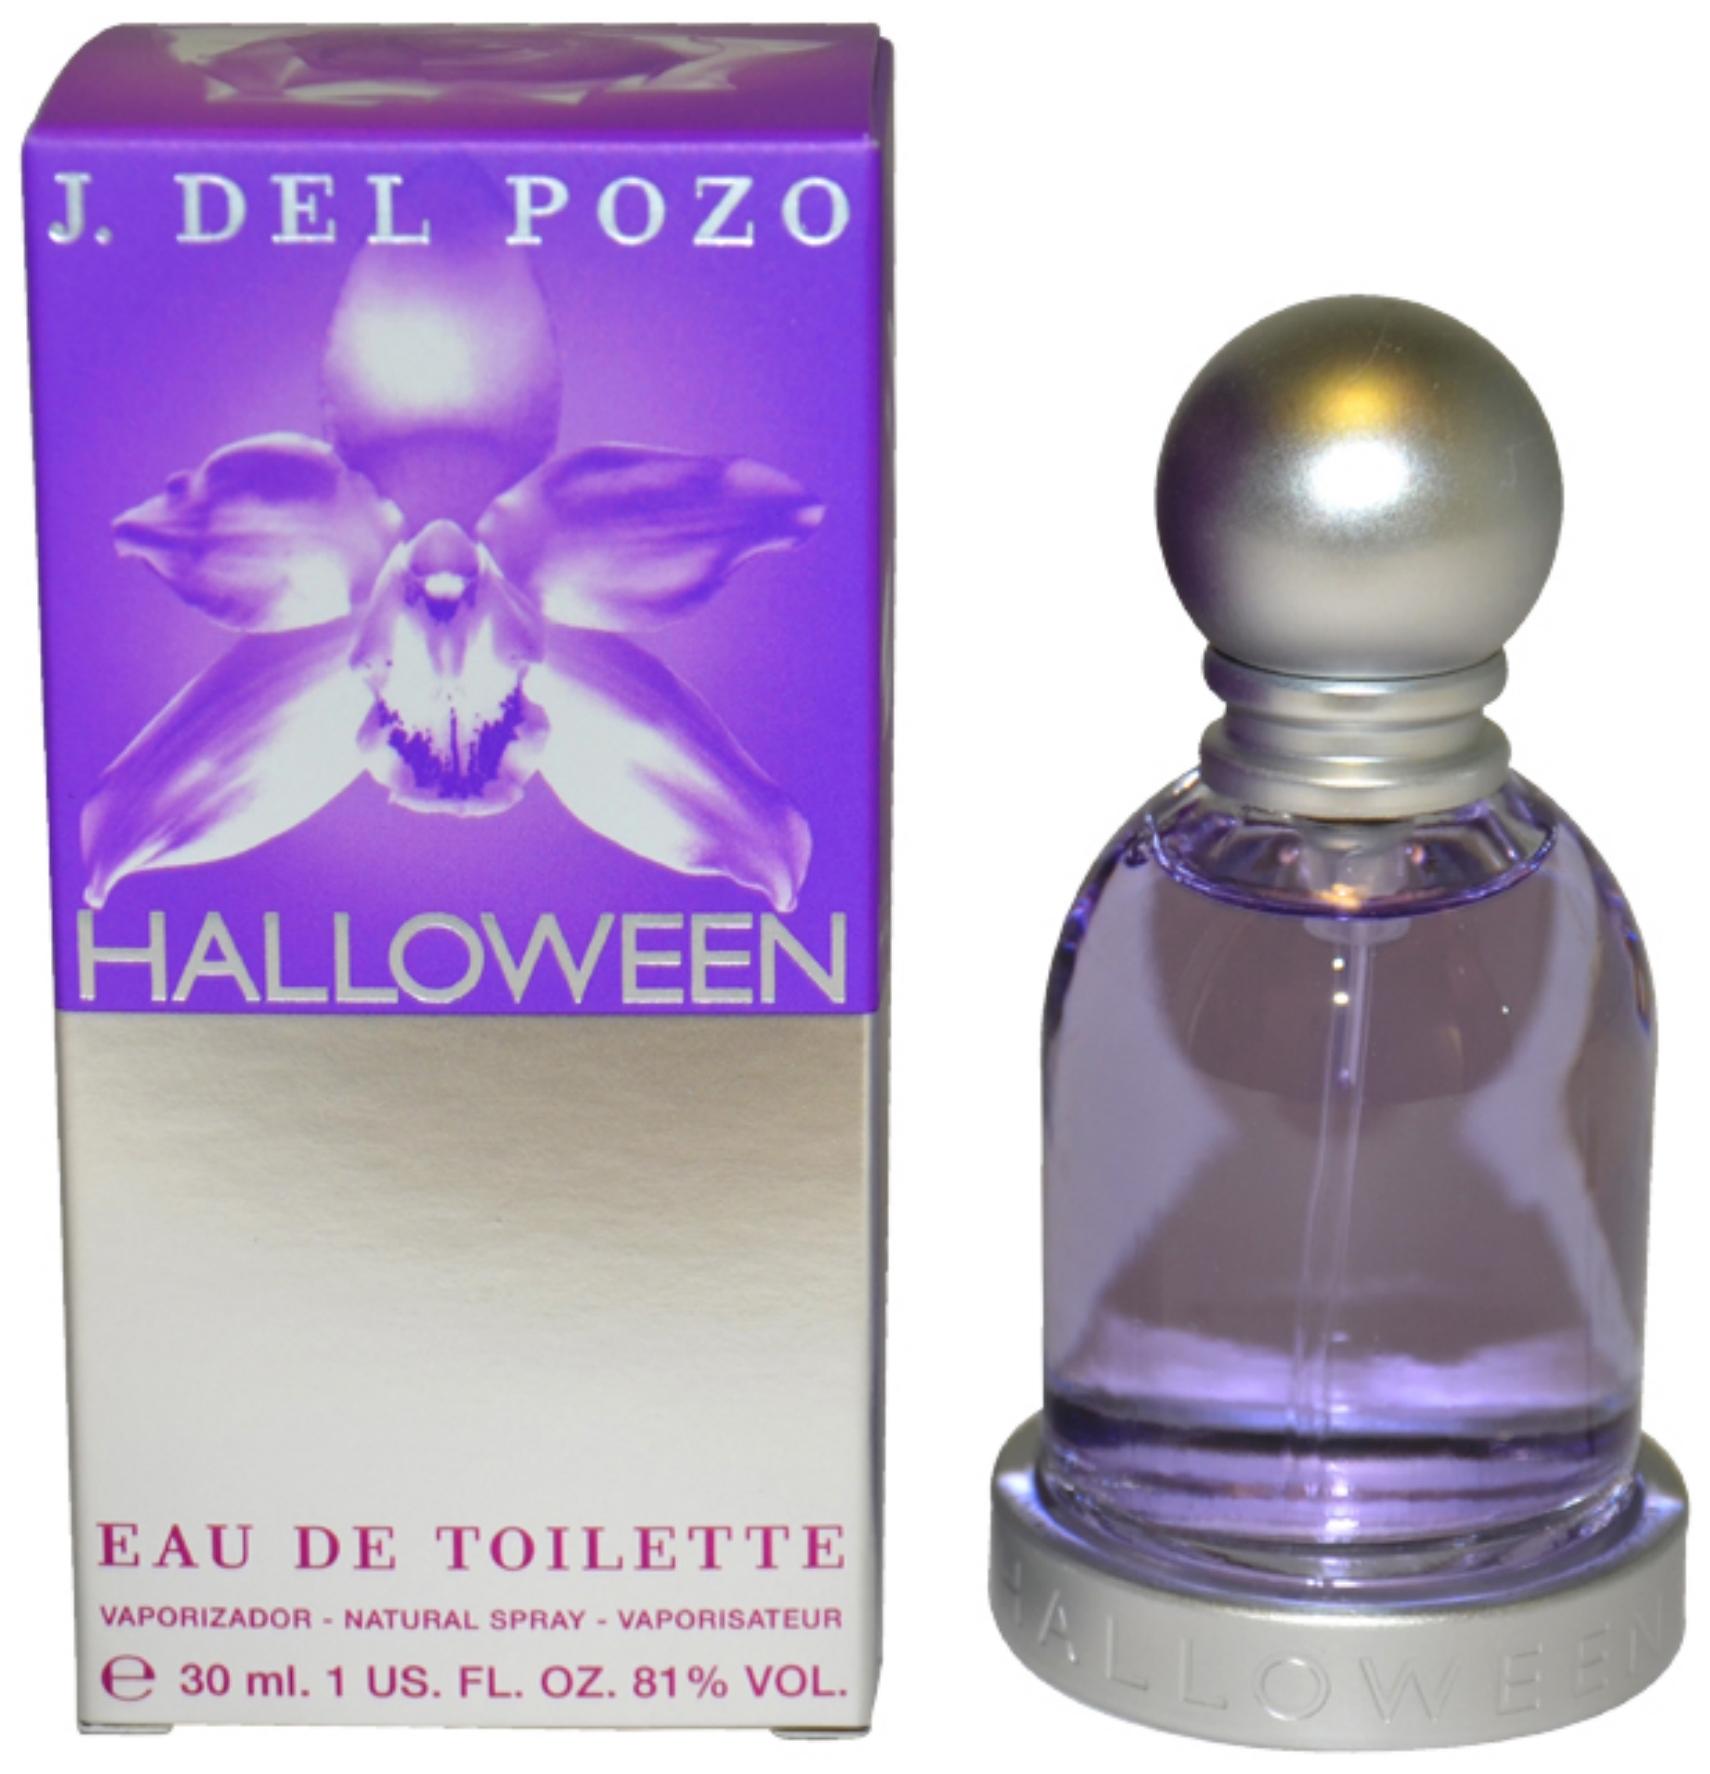 Купить Туалетная вода J. Del Pozo Halloween 30 мл